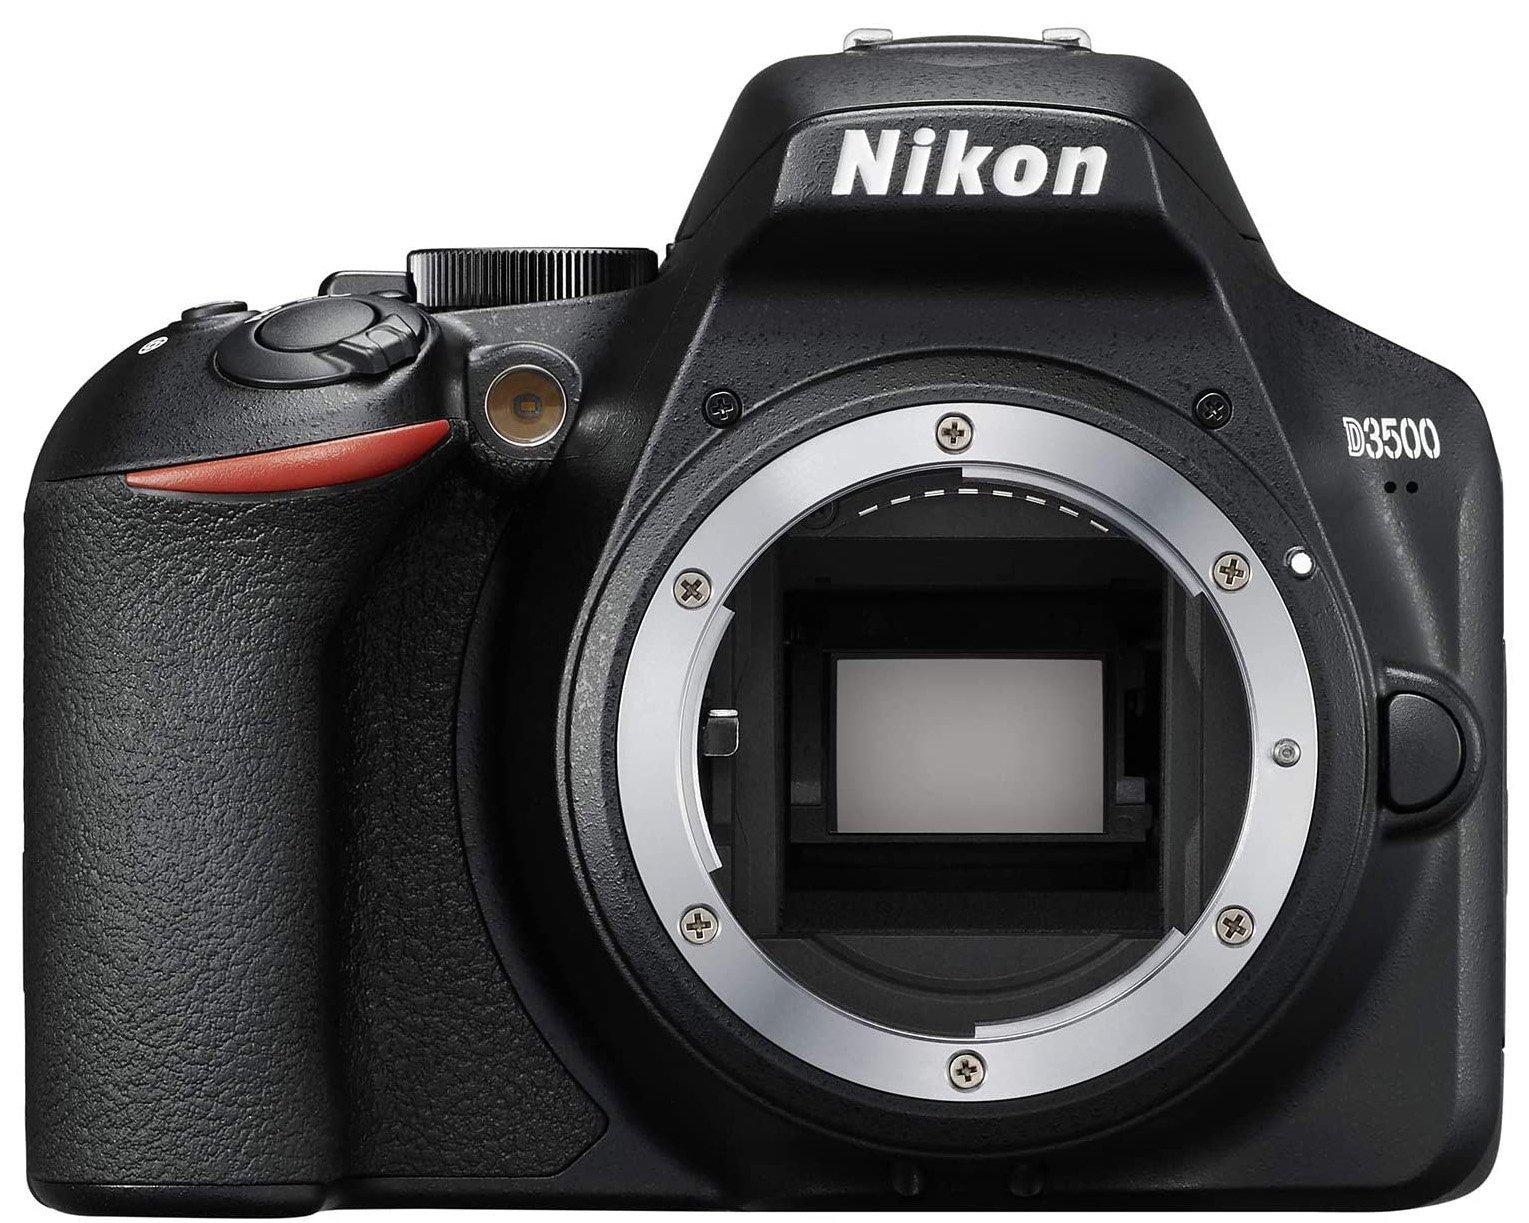 Nikon D3500 - base de datos